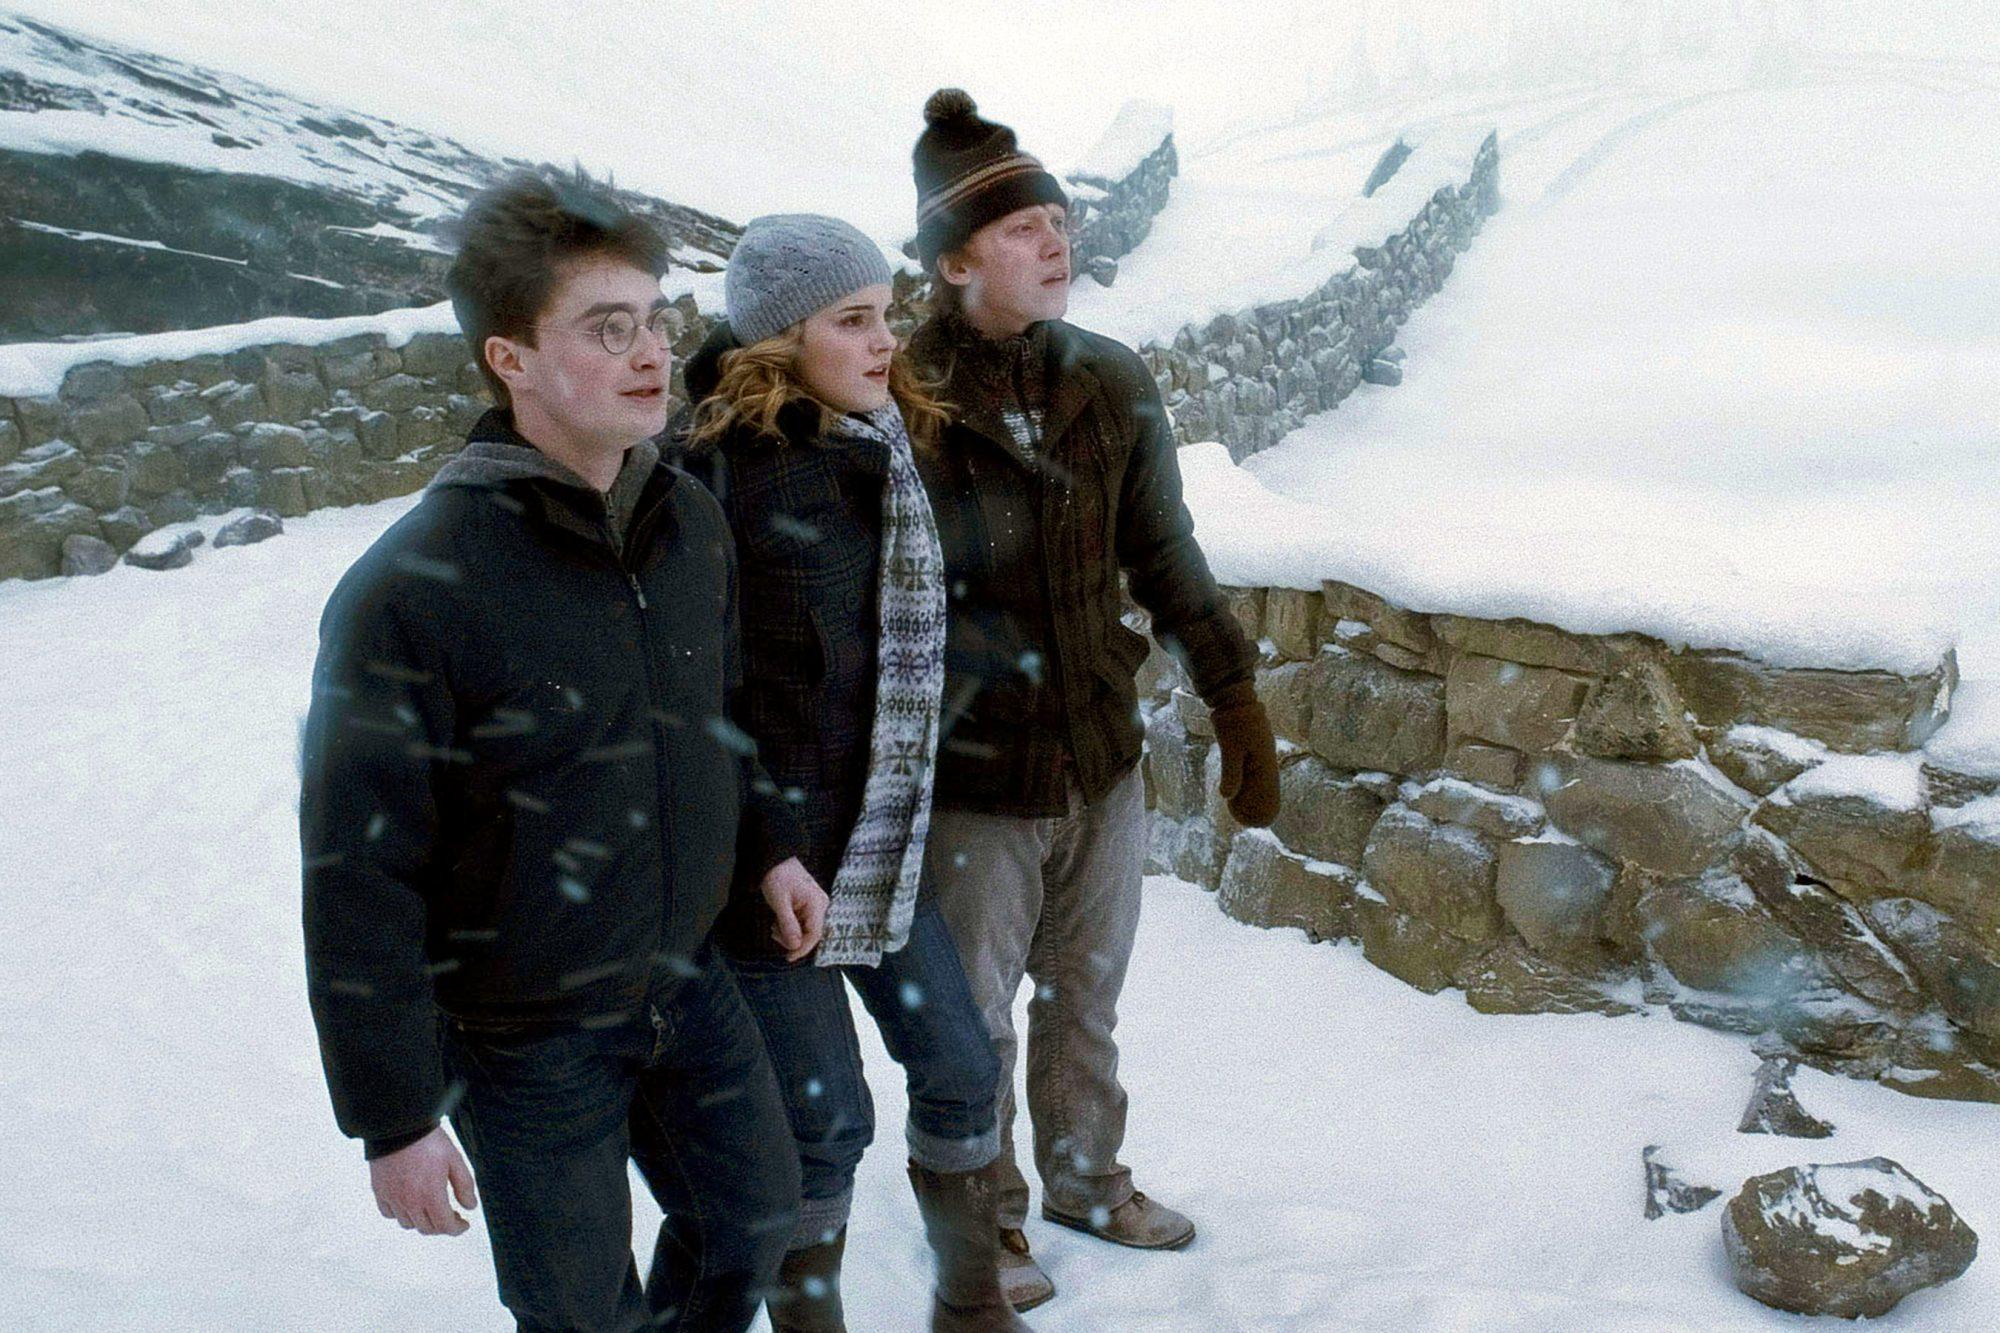 HARRY POTTER AND THE HALF-BLOOD PRINCE, Daniel Radcliffe, Emma Watson, Rupert Grint, 2009. ©Warner B